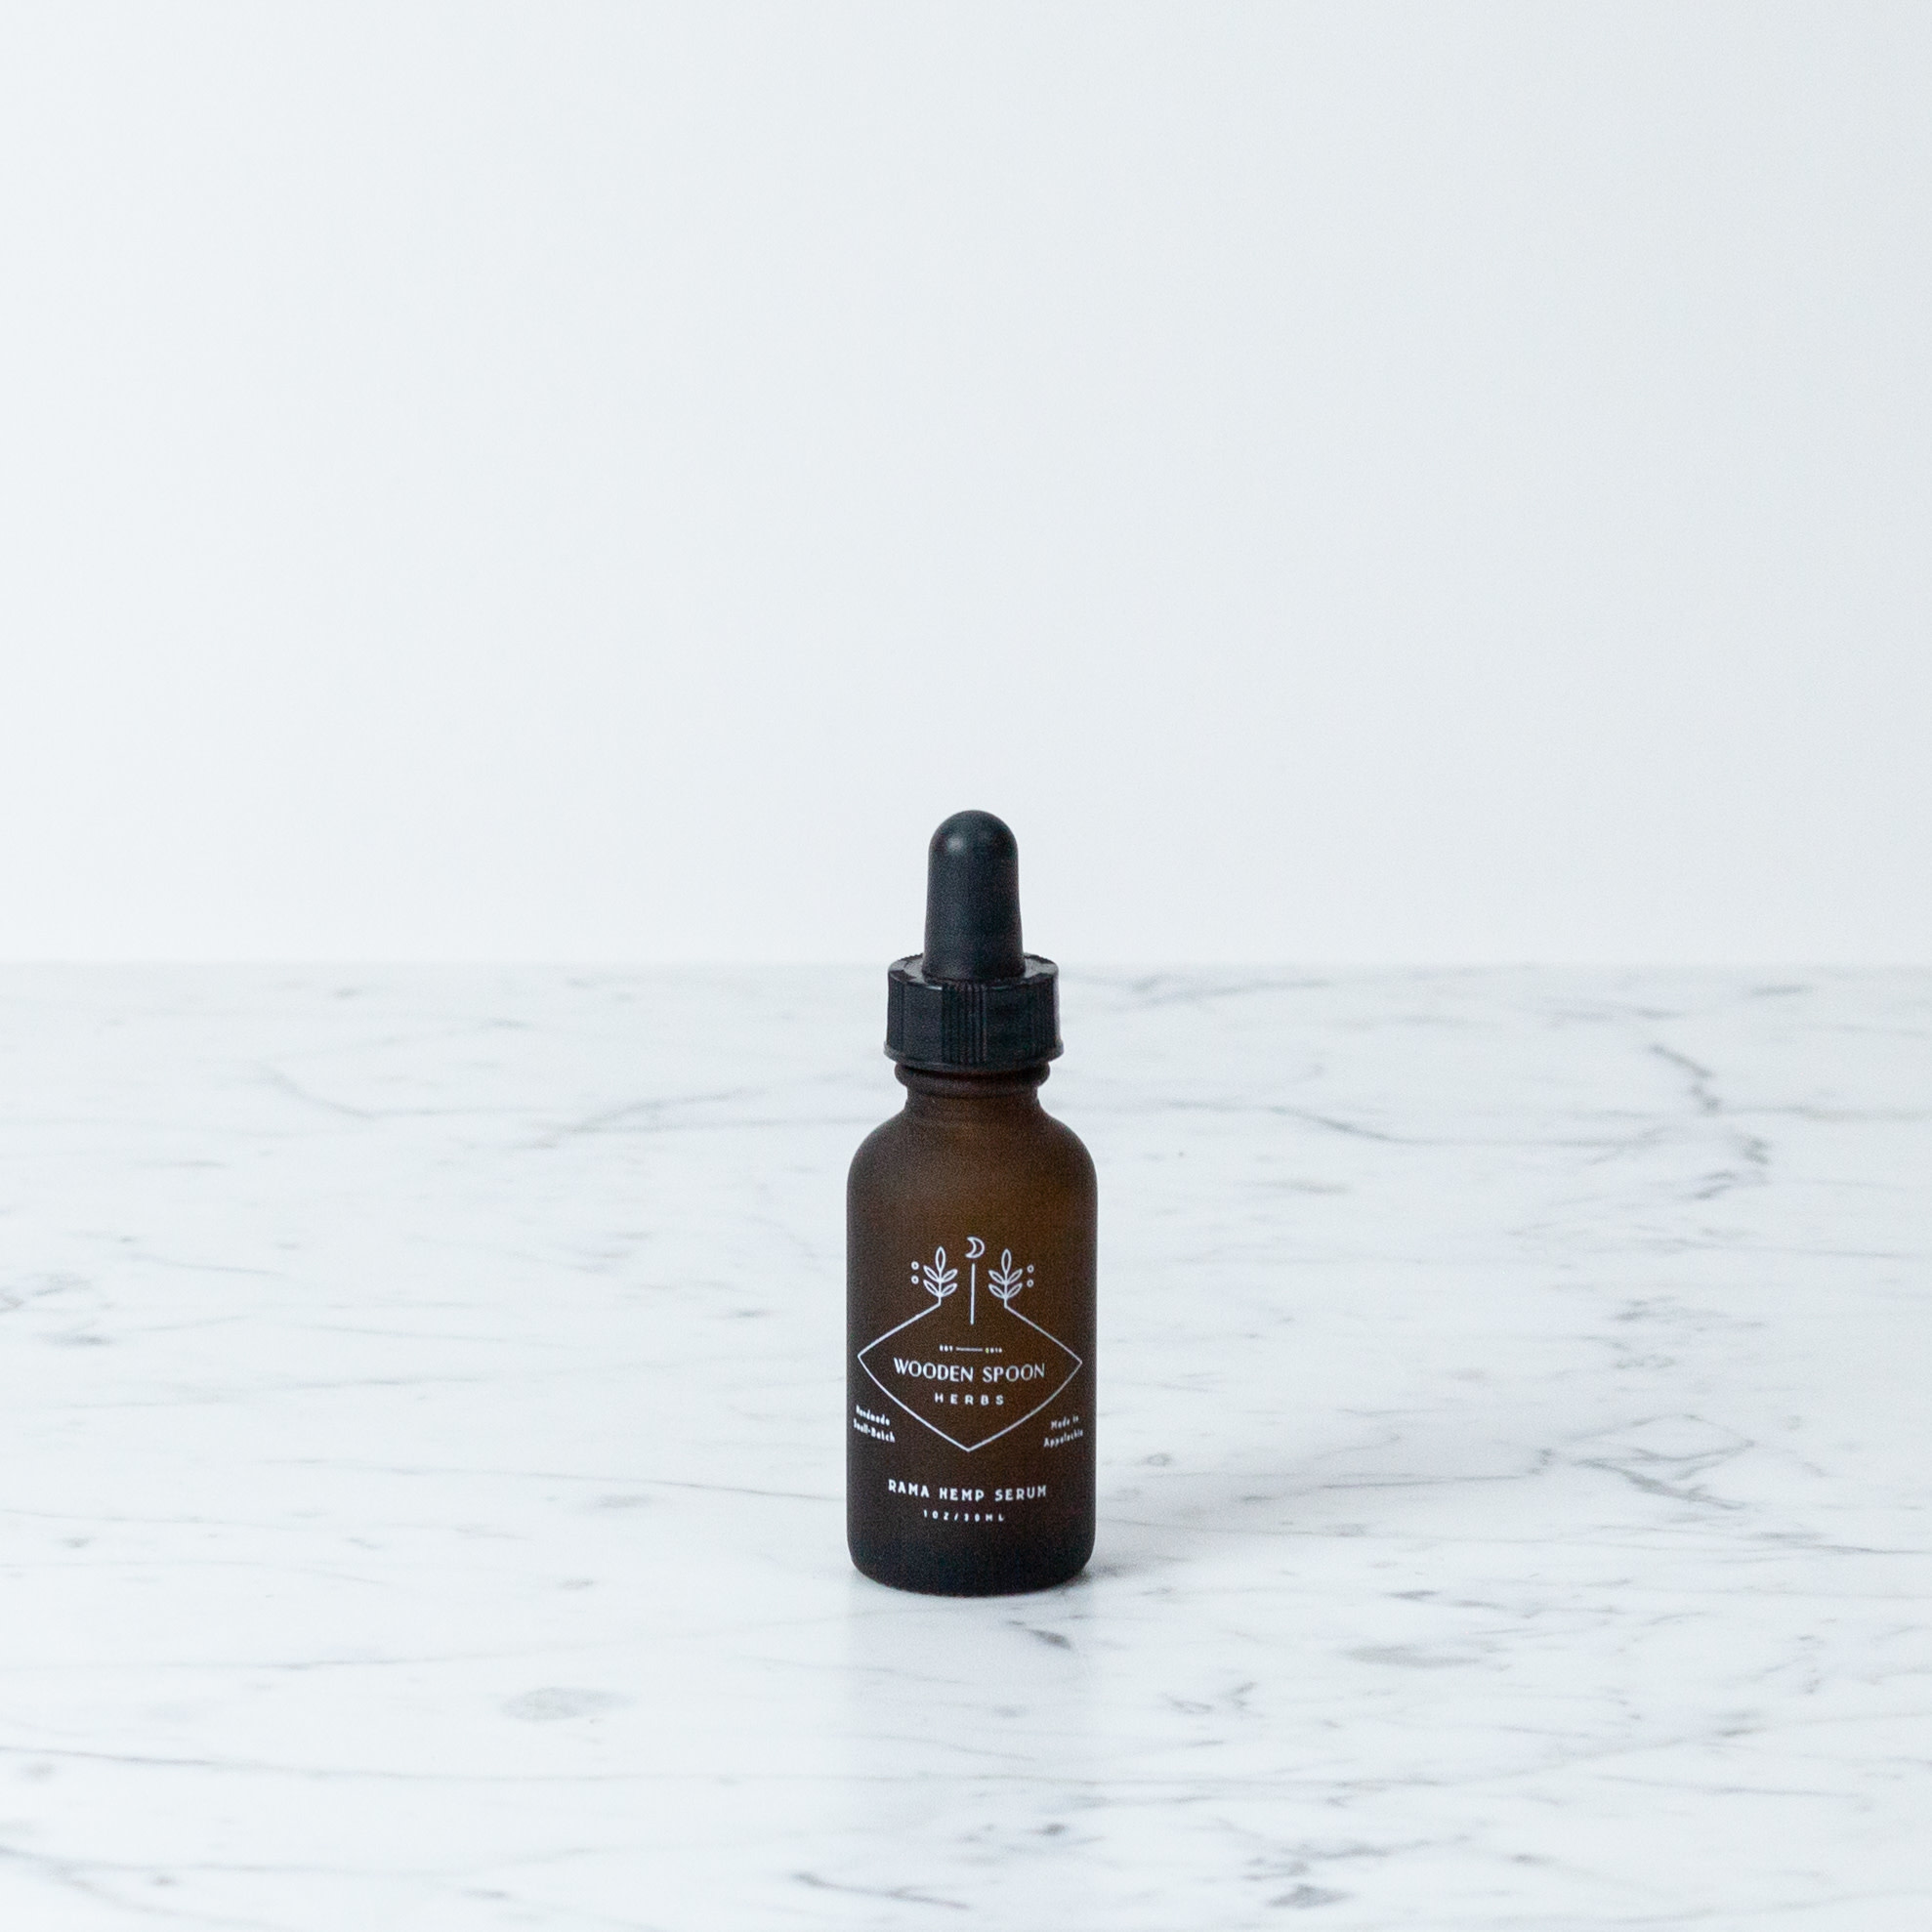 Wooden Spoon Herbs Rama Hemp Skin Serum